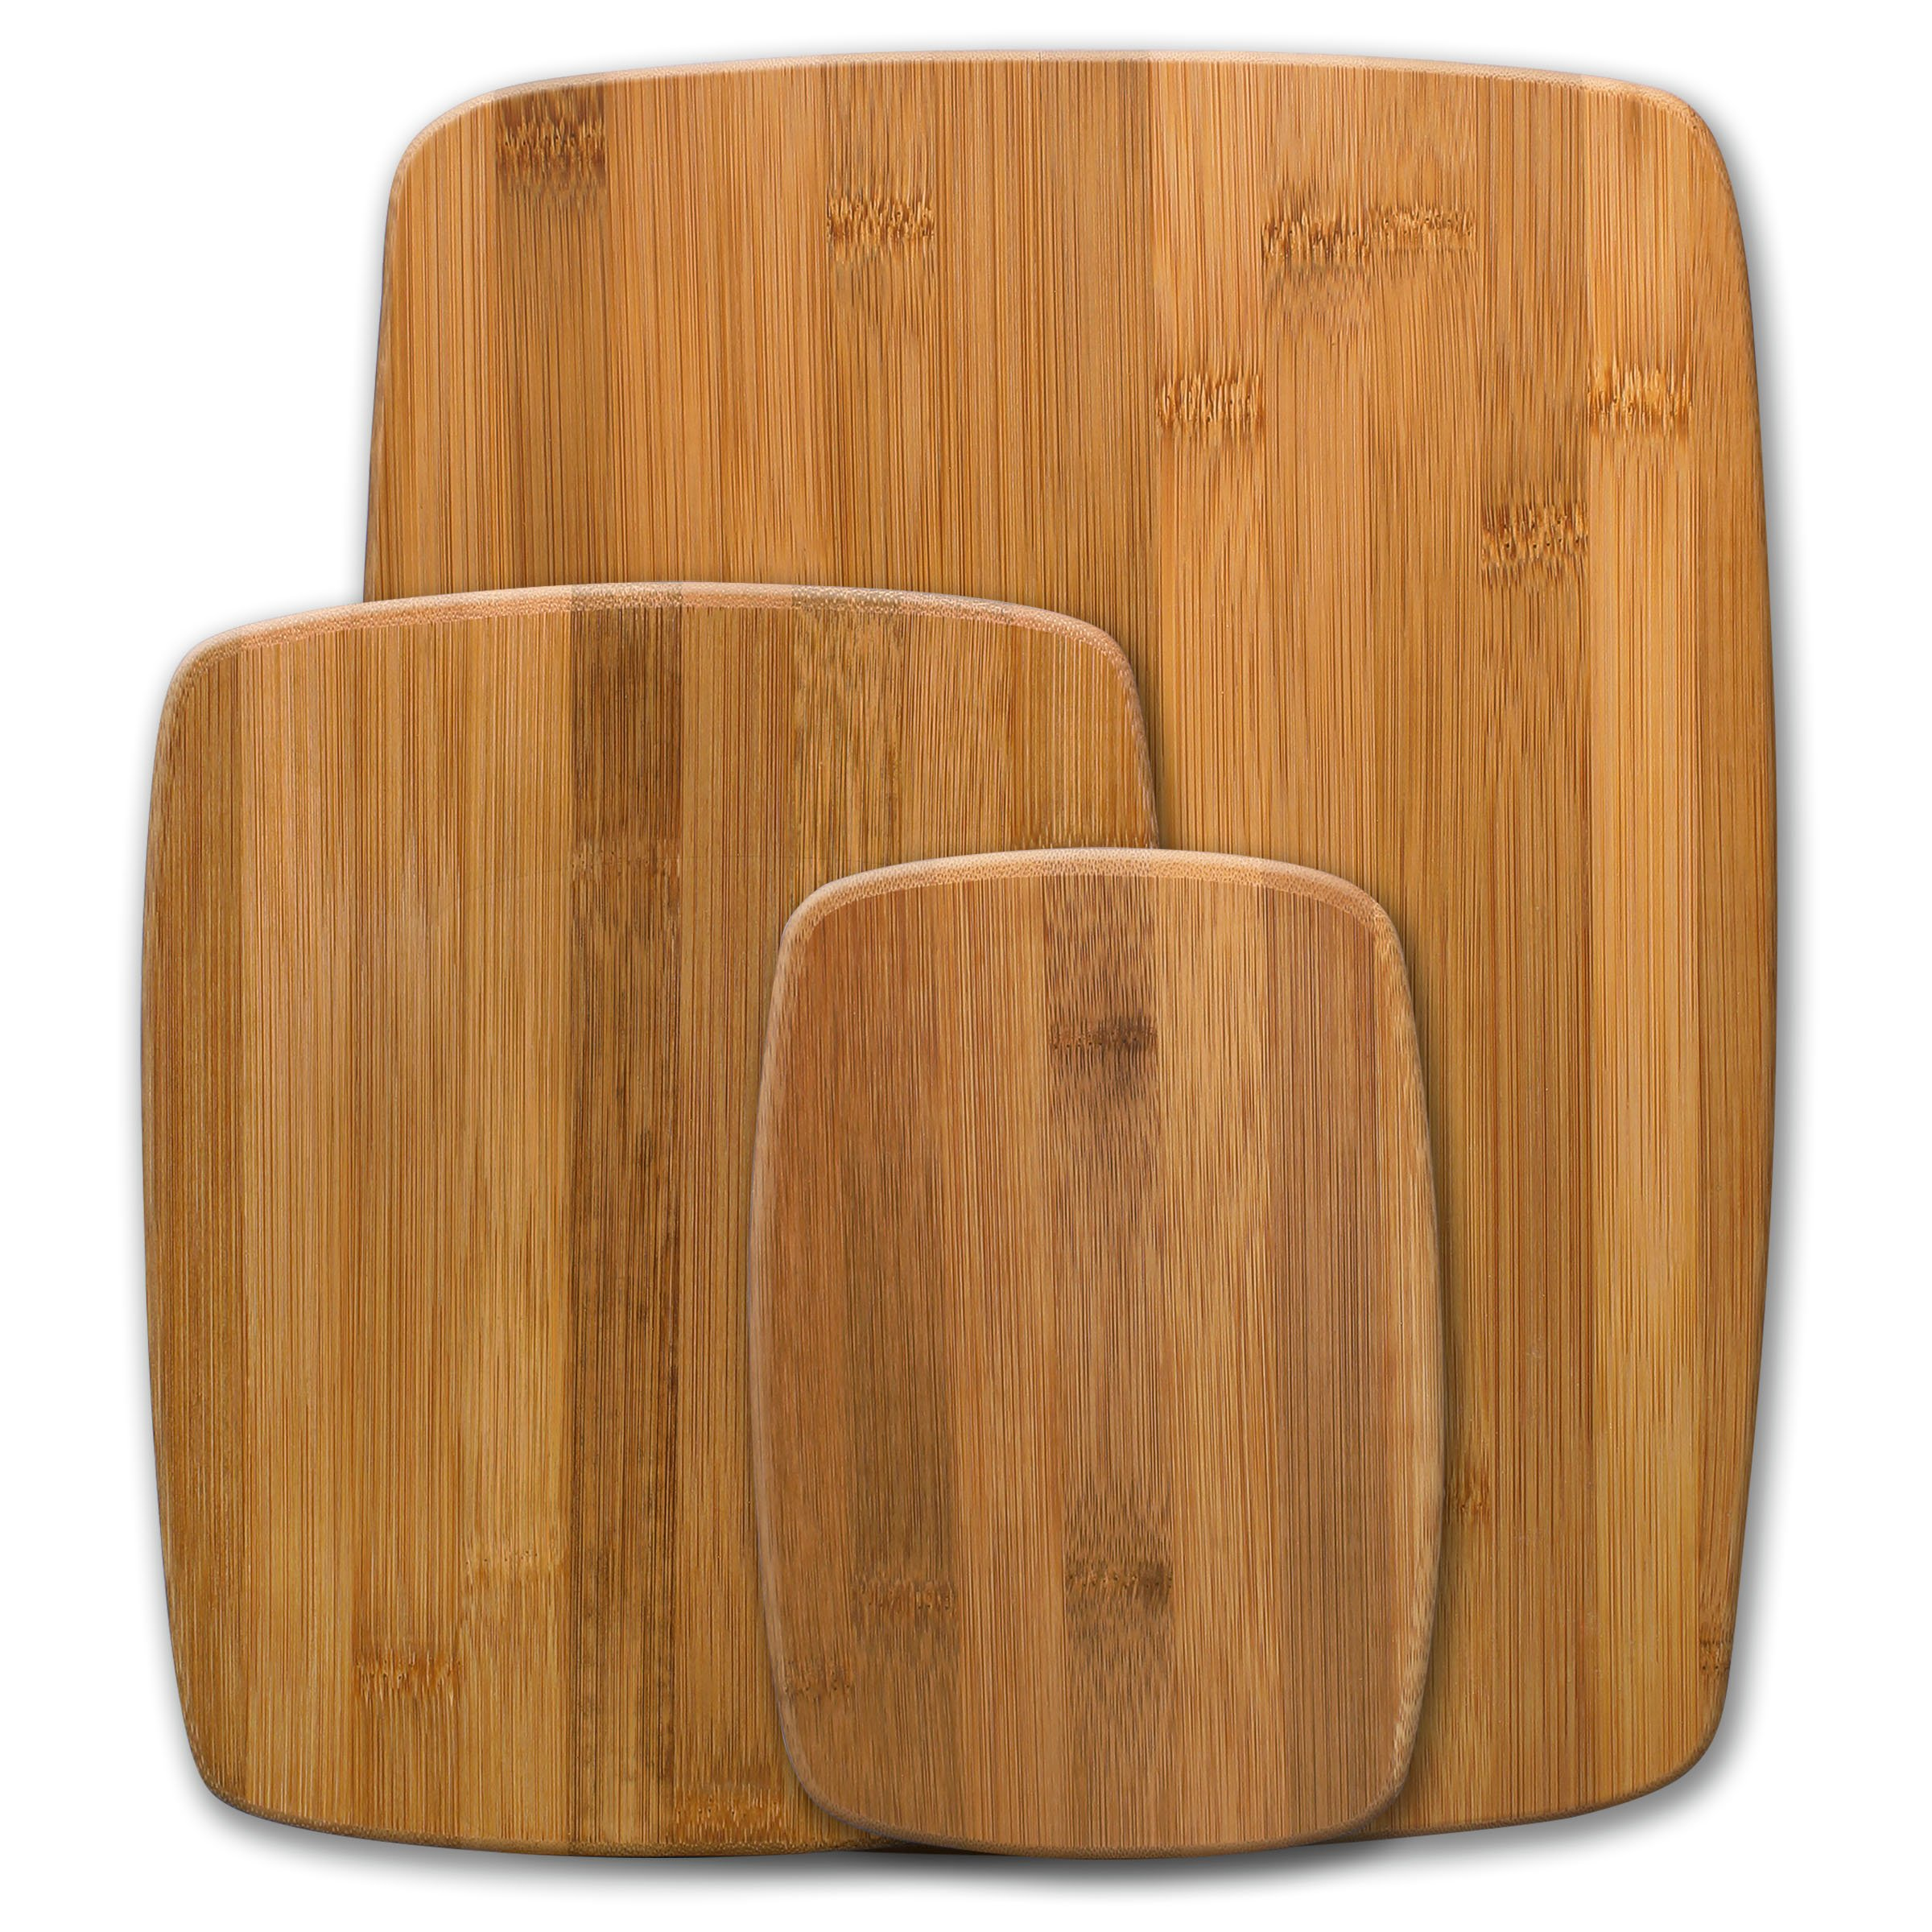 Farberware 5070344 Bamboo Cutting Board, Set of 3, by Farberware